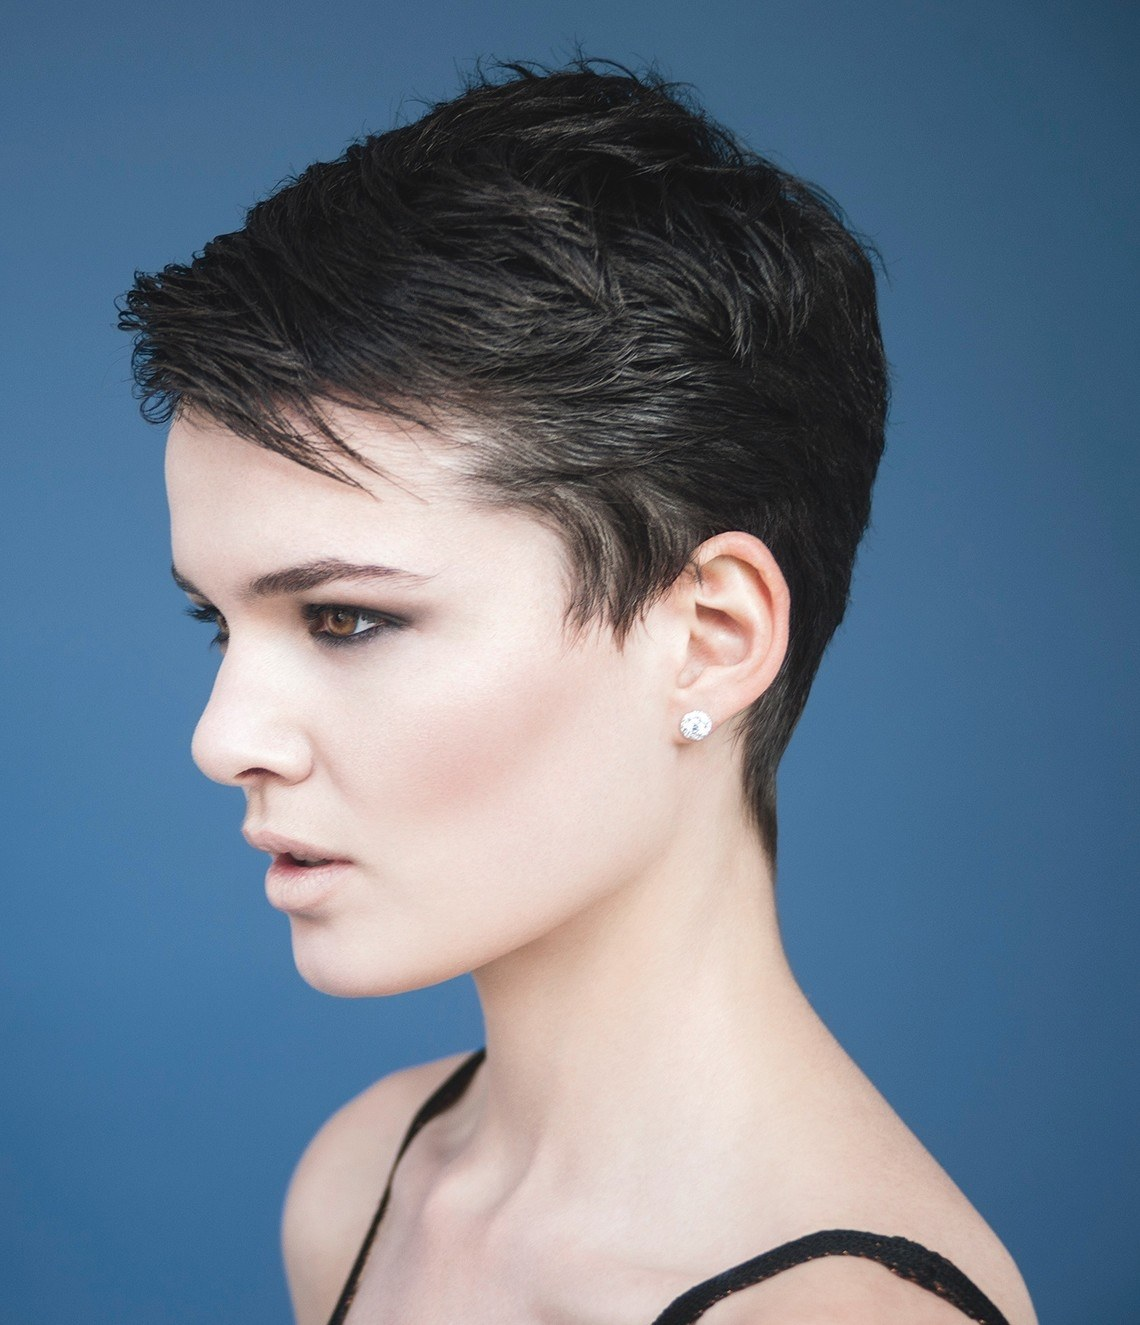 Masculine Short Cut